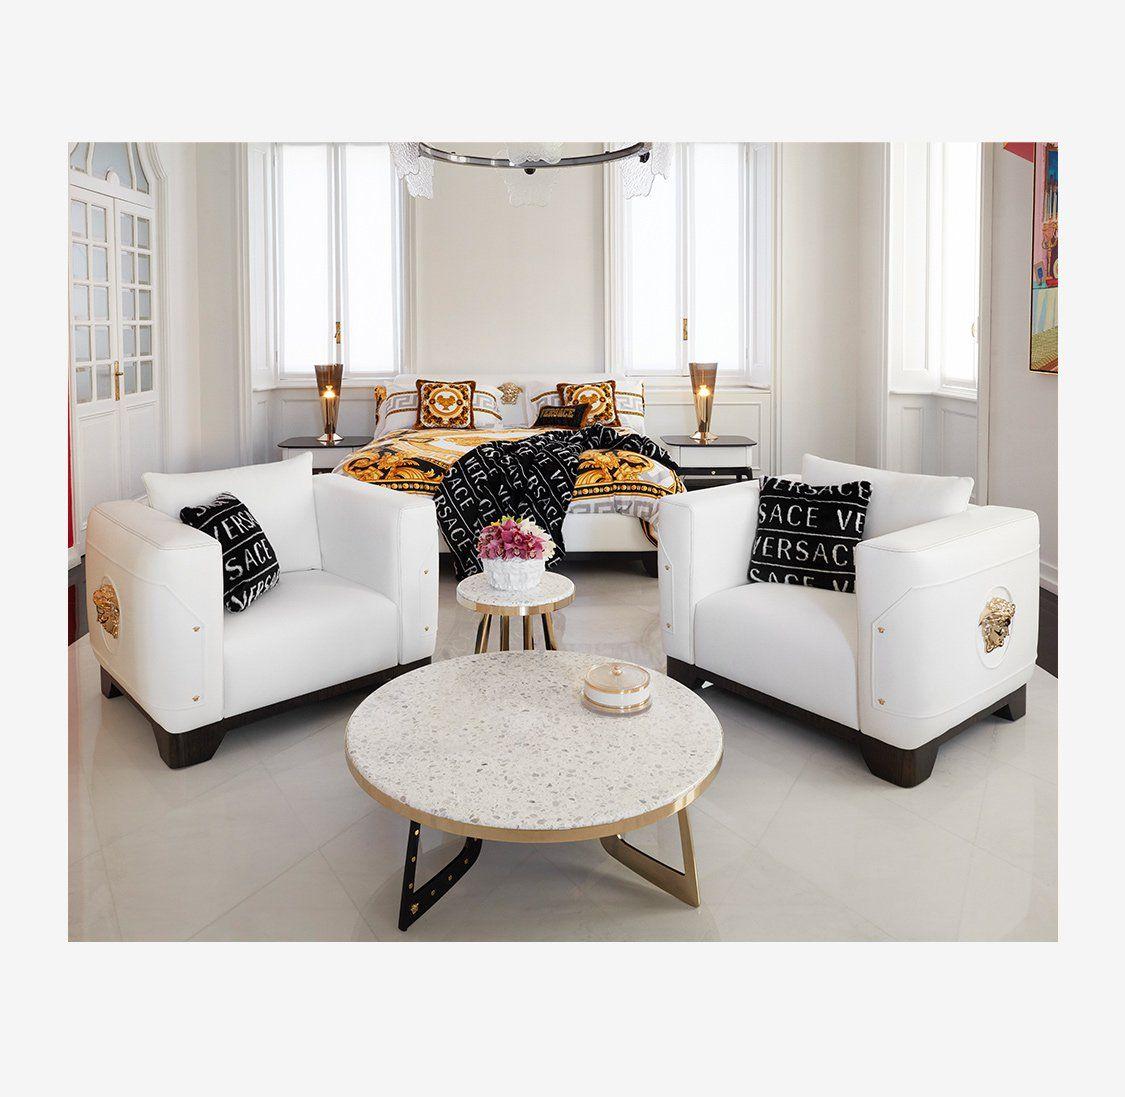 Versace Furniture Living Room Sets Furniture Versace Furniture